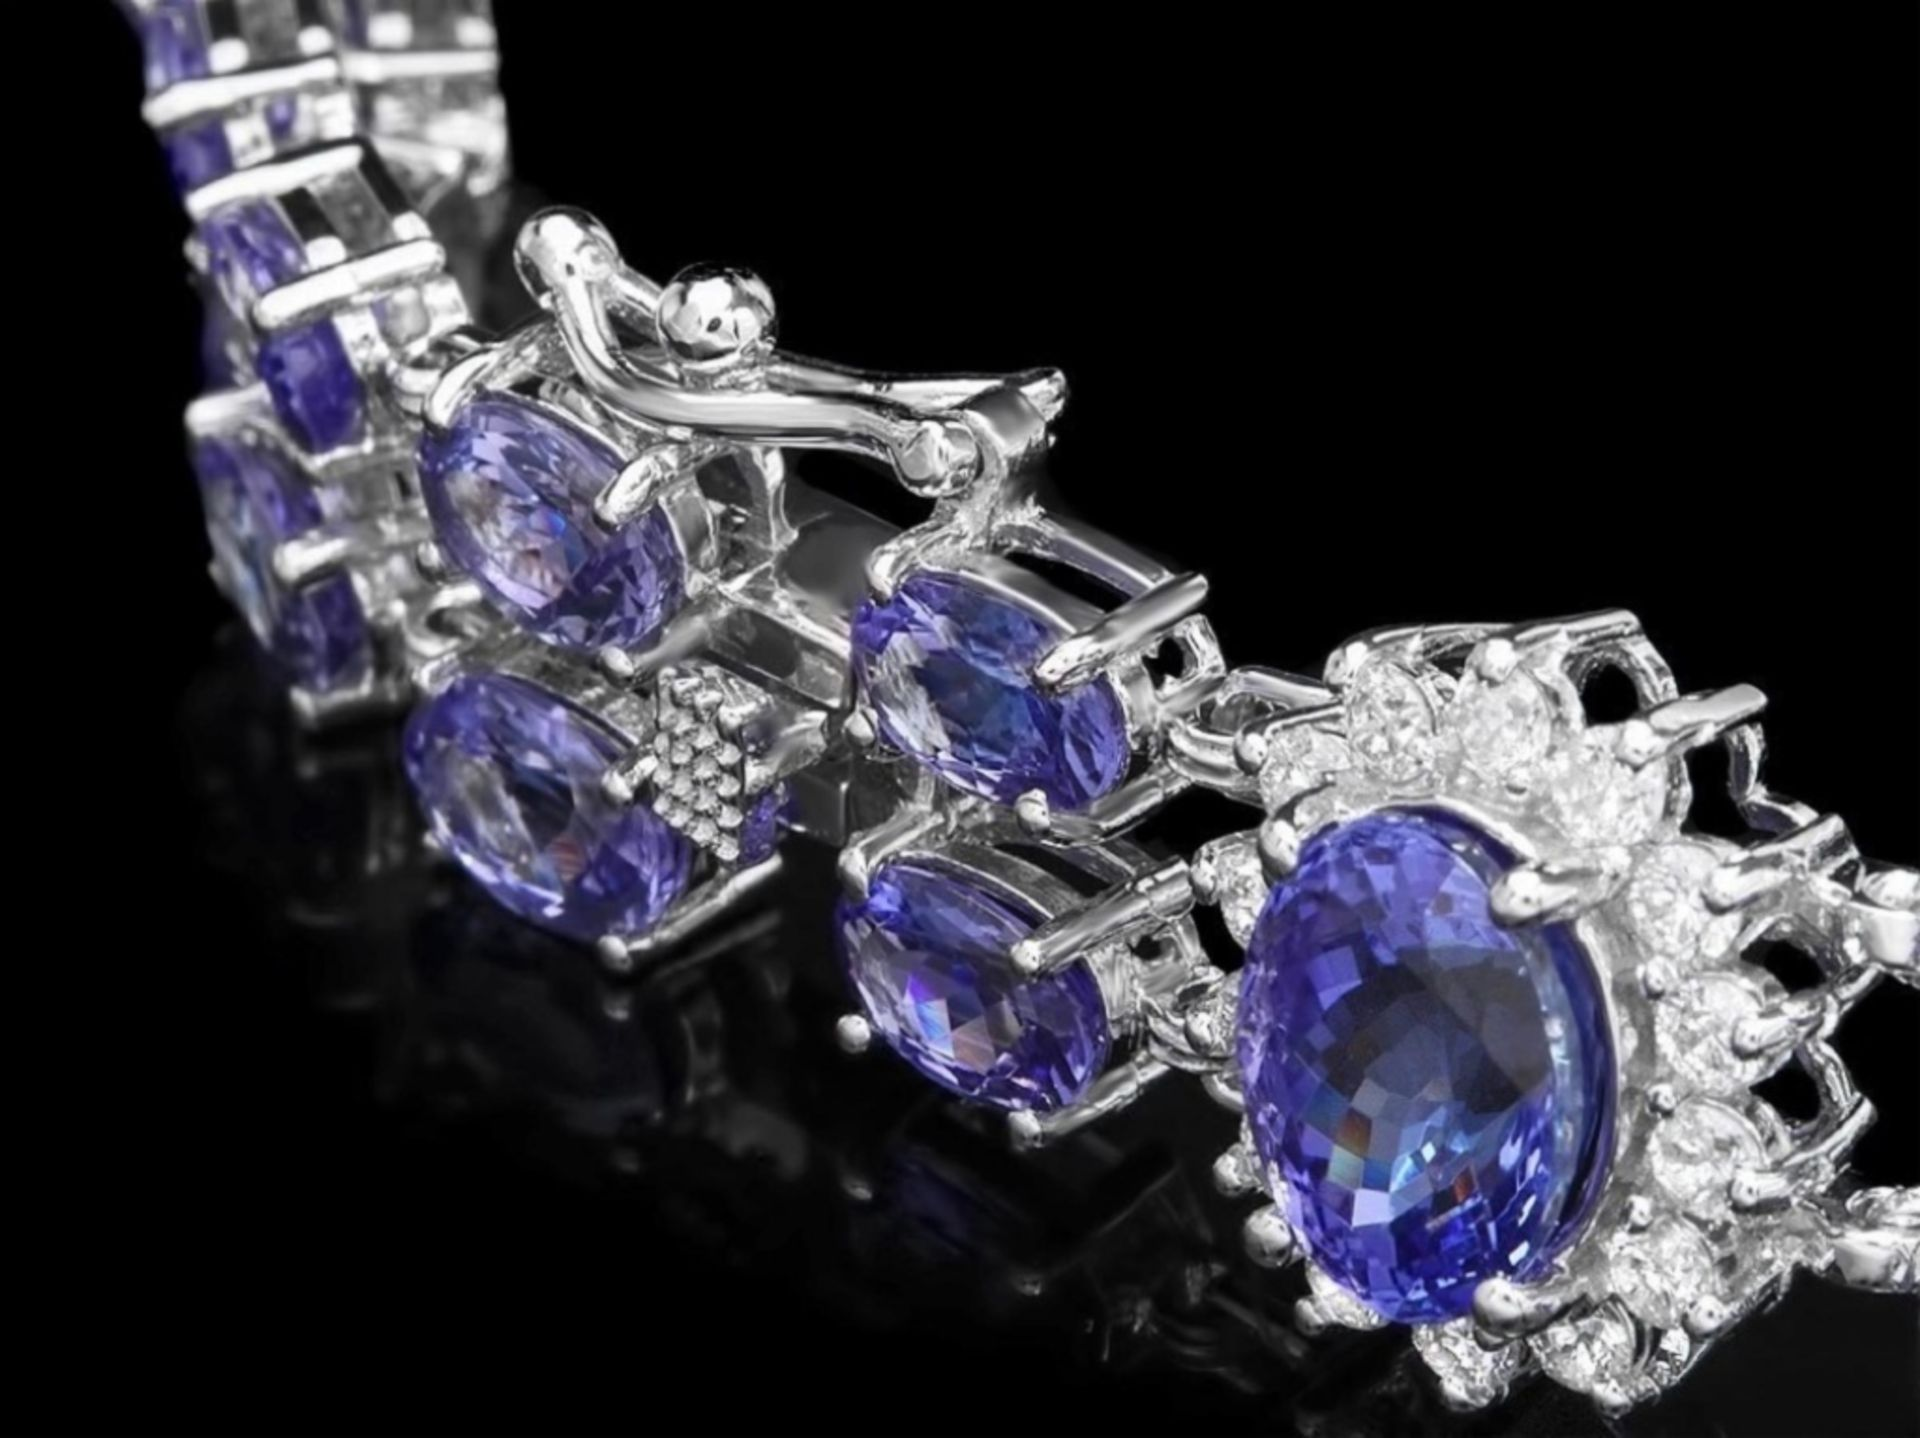 `14k Gold 20.00ct Tanzanite & 1.50ct Diamond Brace - Image 3 of 4